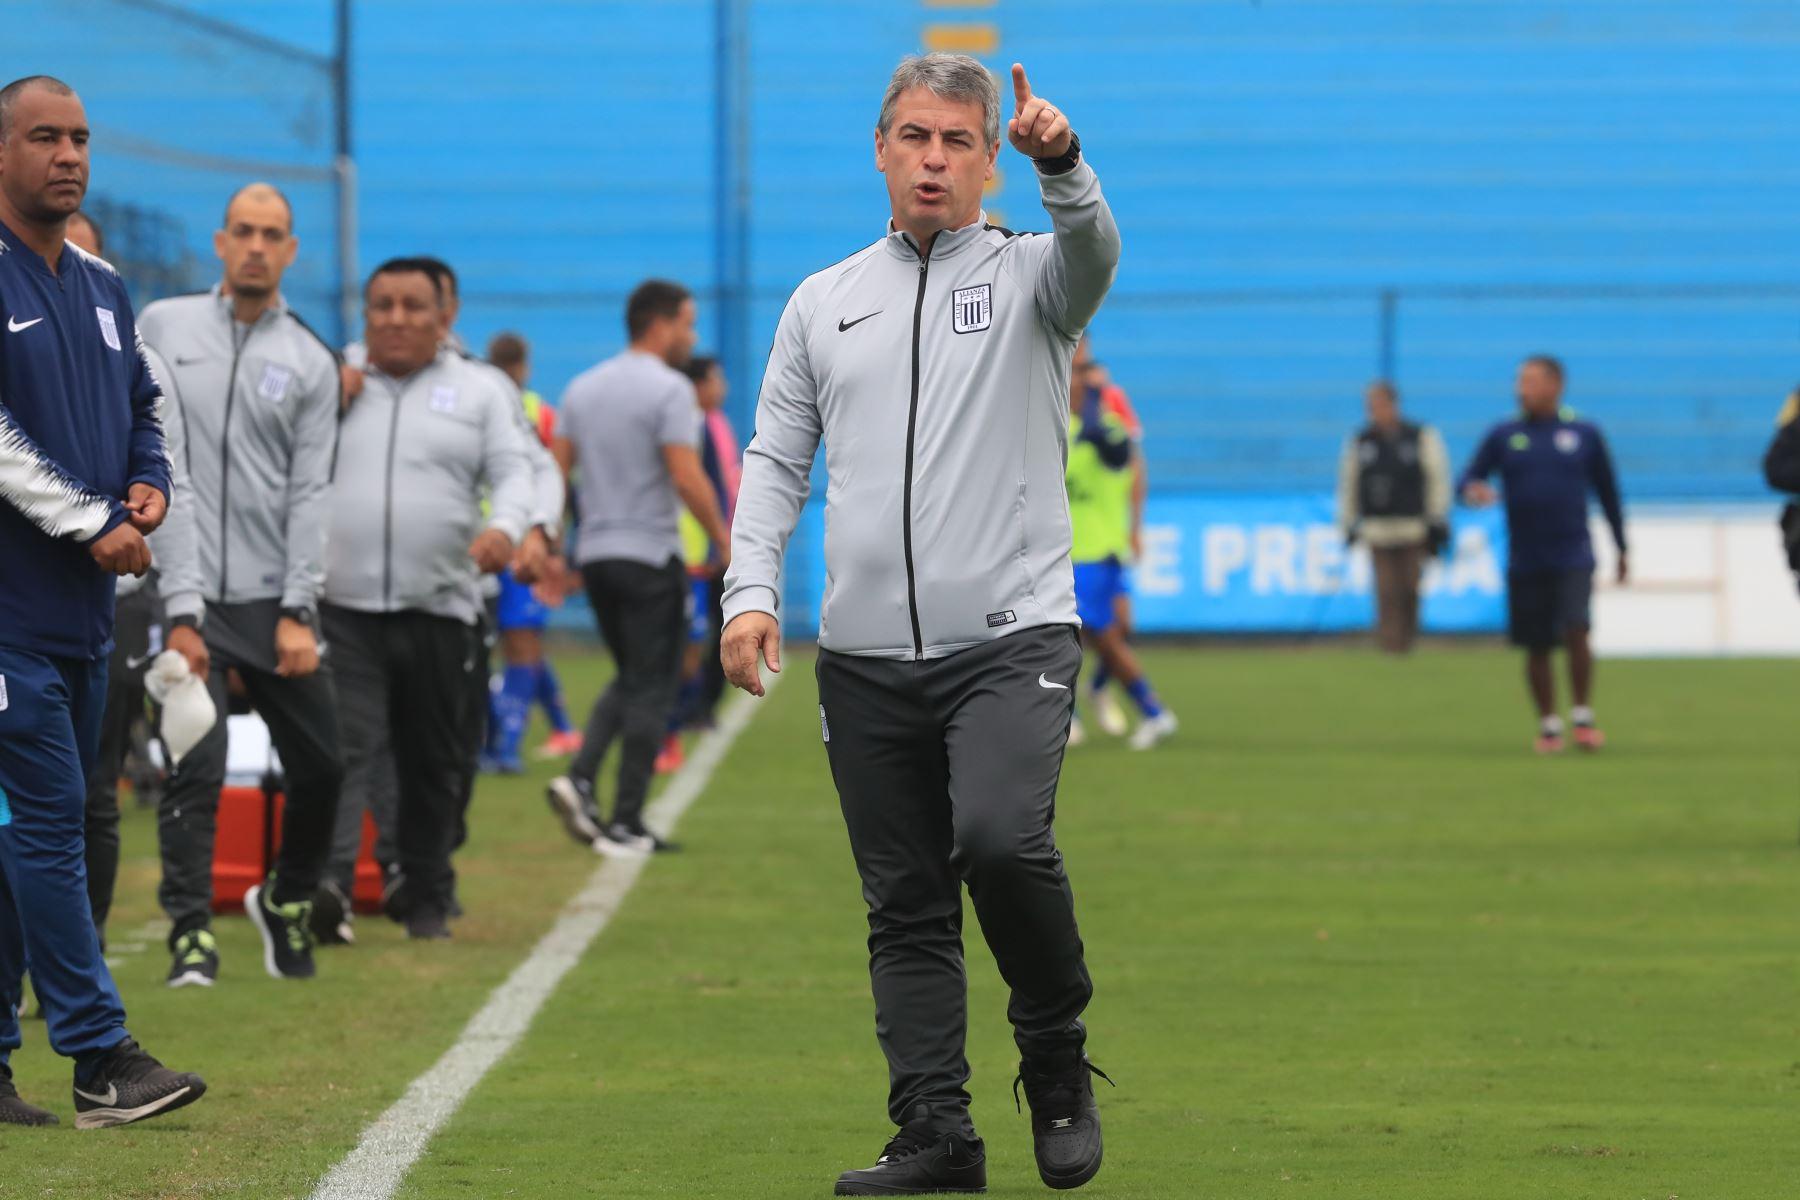 Pablo Bengochea entrenador de Alianza Lima. Partido disputado en Lima donde Alianza Lima empató 1-1 ante Unión Comercio.  Foto: ANDINA/Juan Carlos Guzmán Negrini.